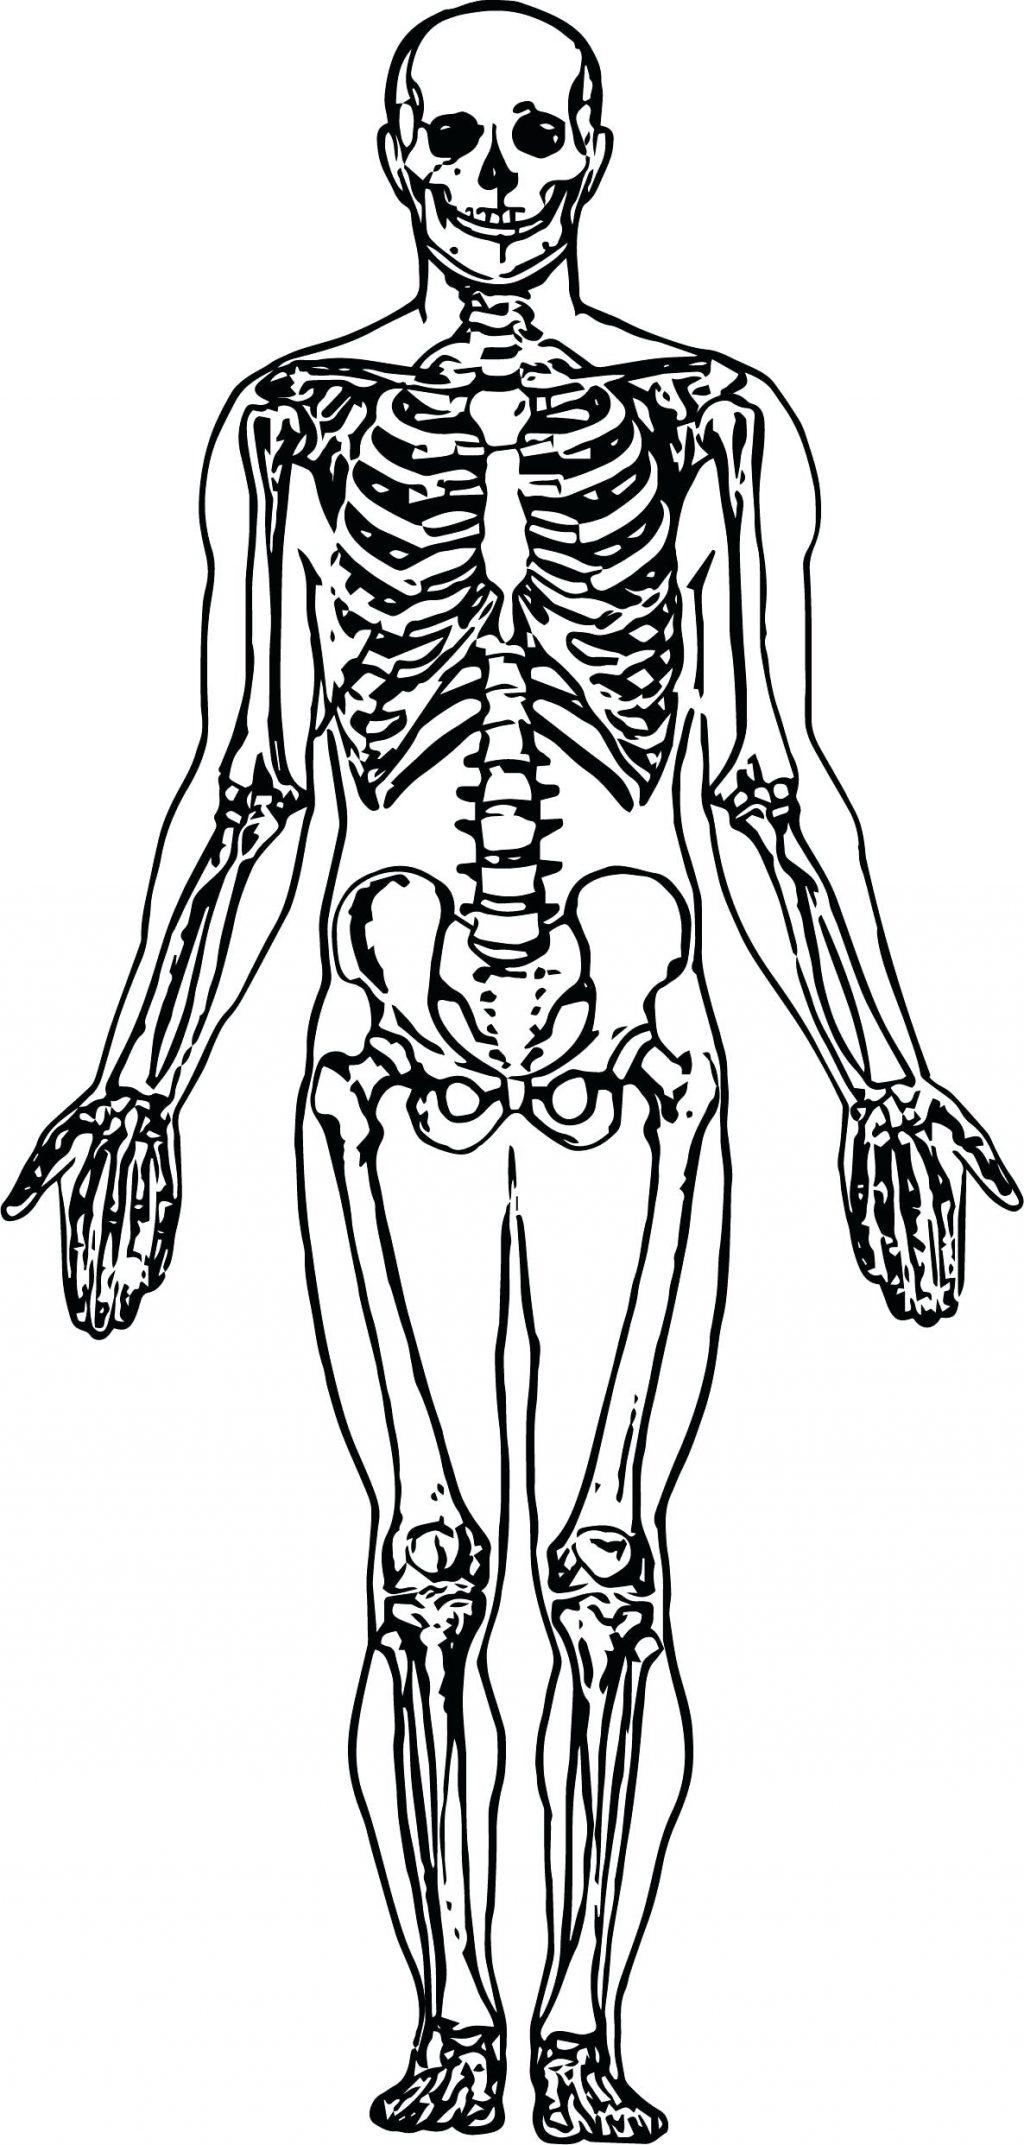 Dinosaur Skeleton Coloring Pages at GetDrawings   Free ...